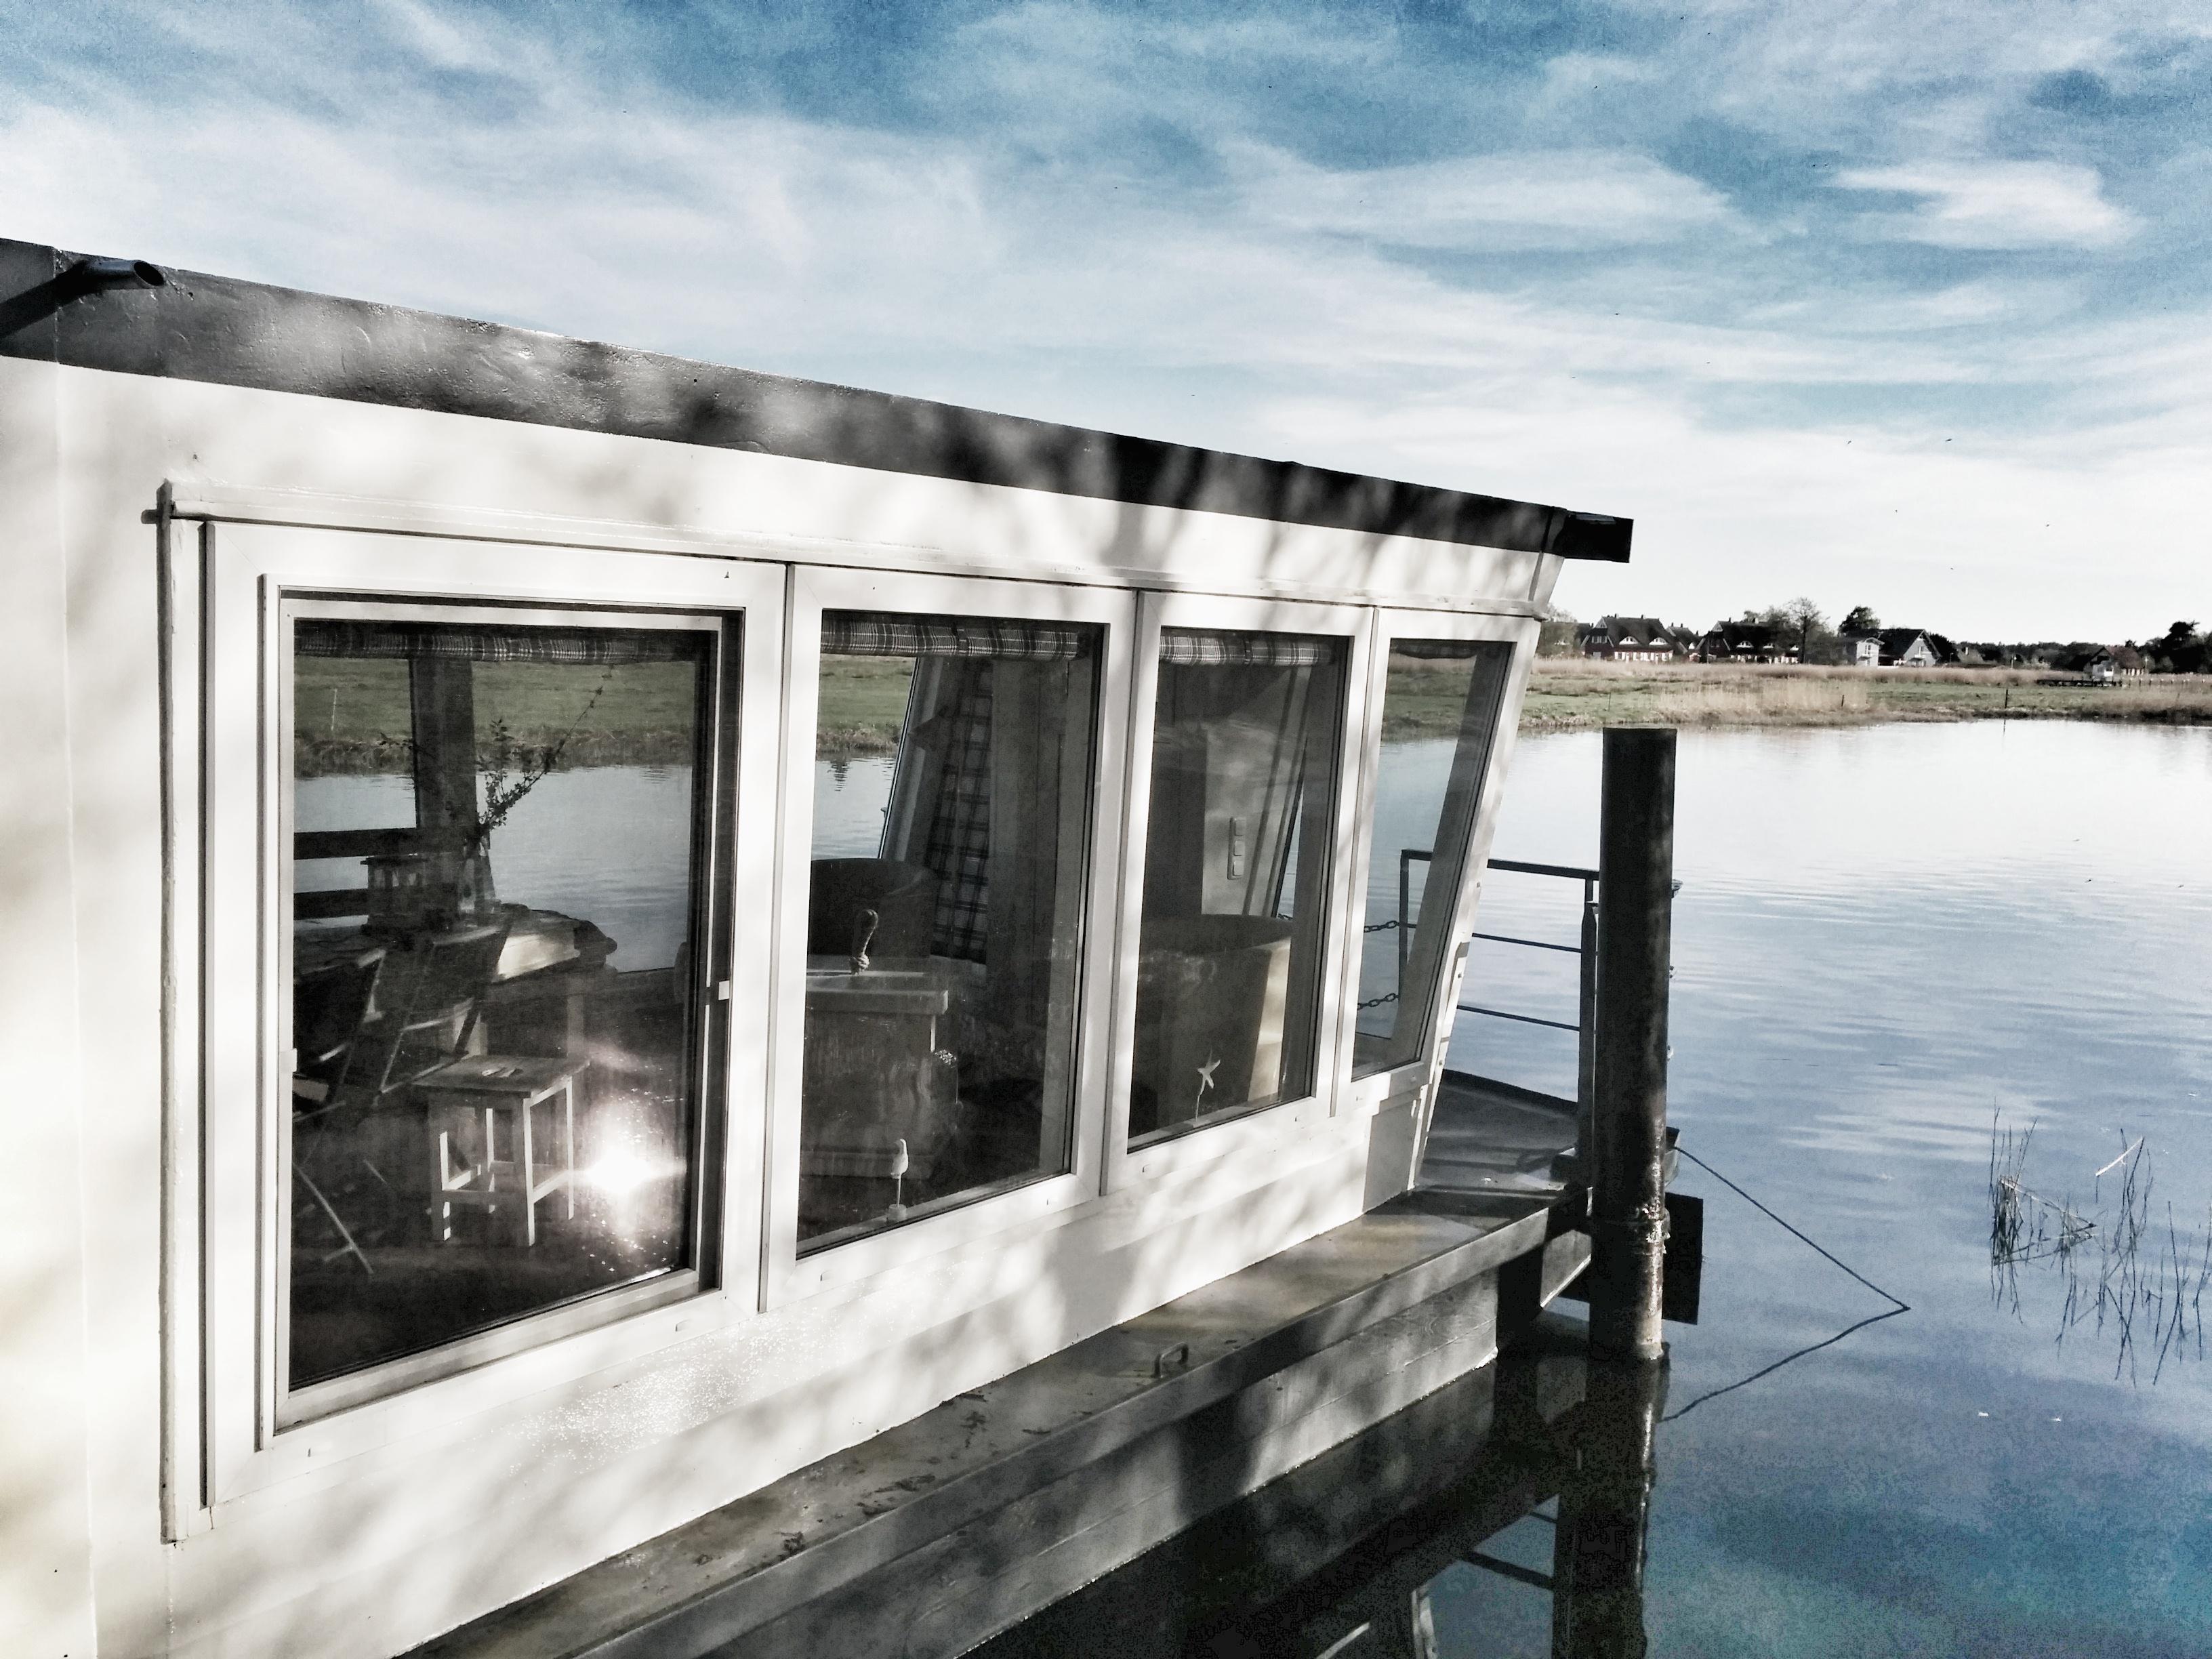 Das Wohnschiff Neptun in Prerow